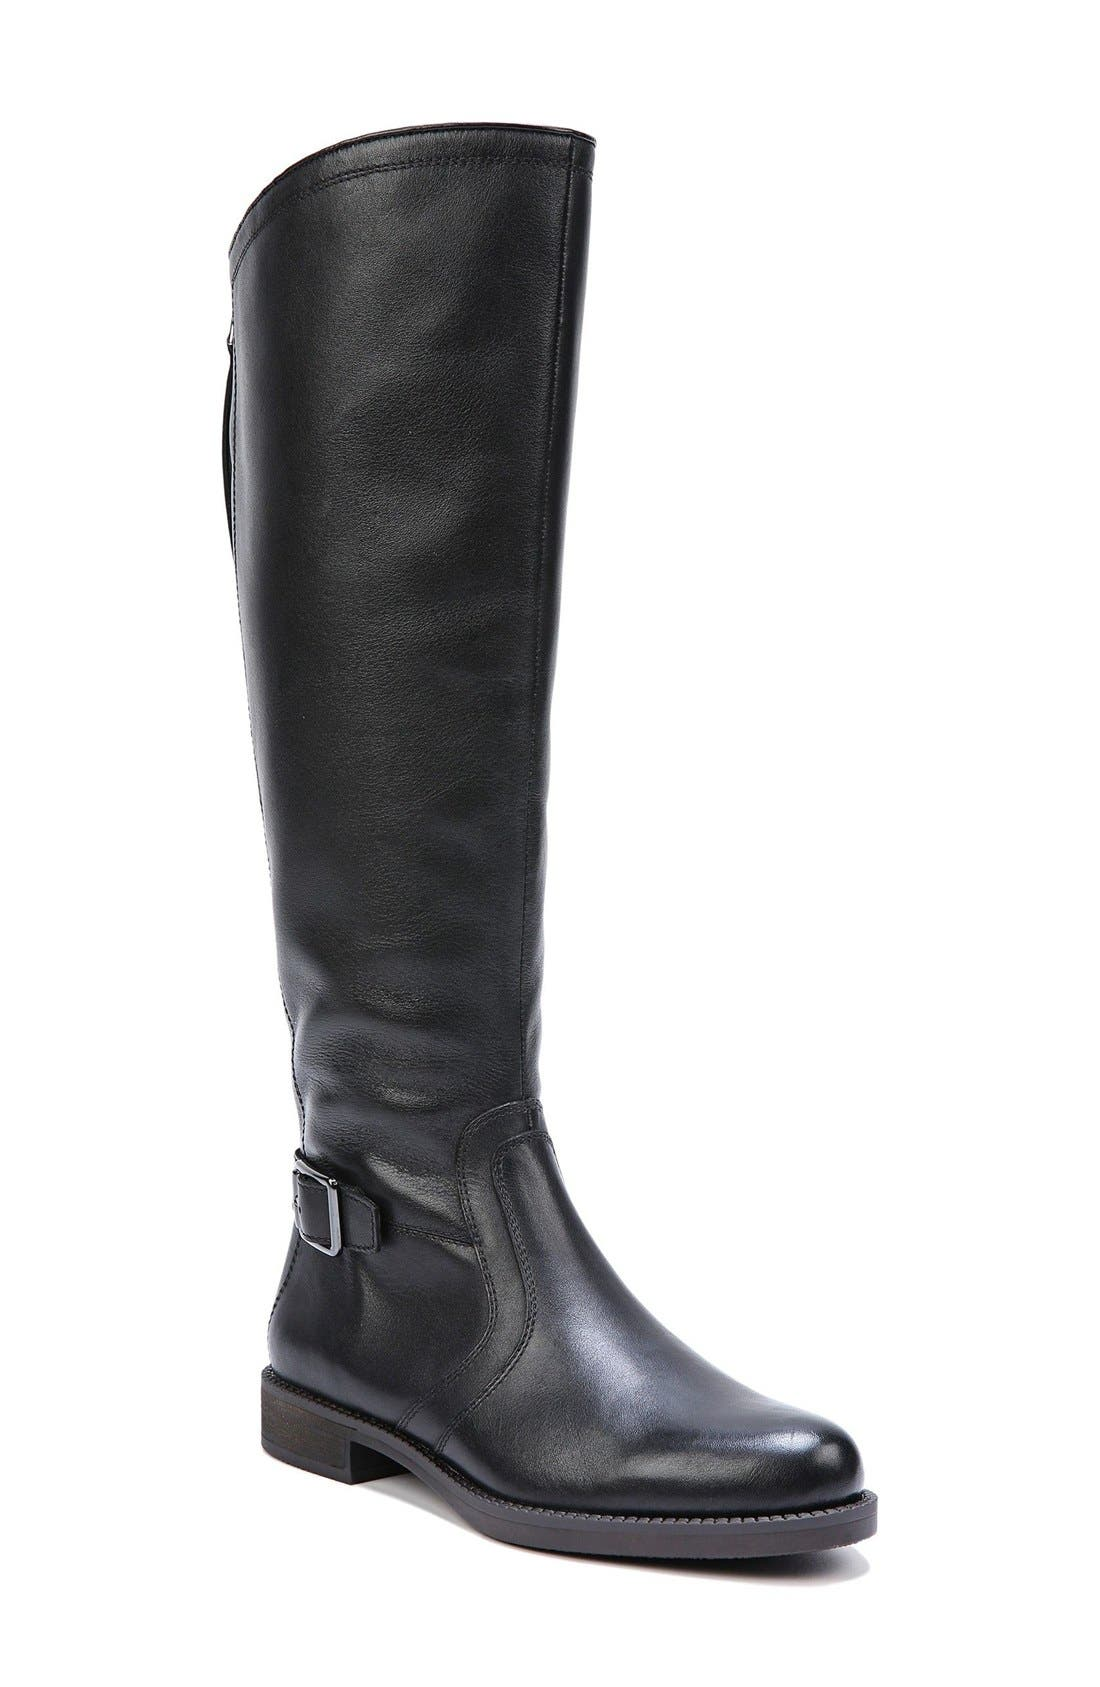 Main Image - SARTO by Franco Sarto Carlana Riding Boot (Women) (Wide Calf)